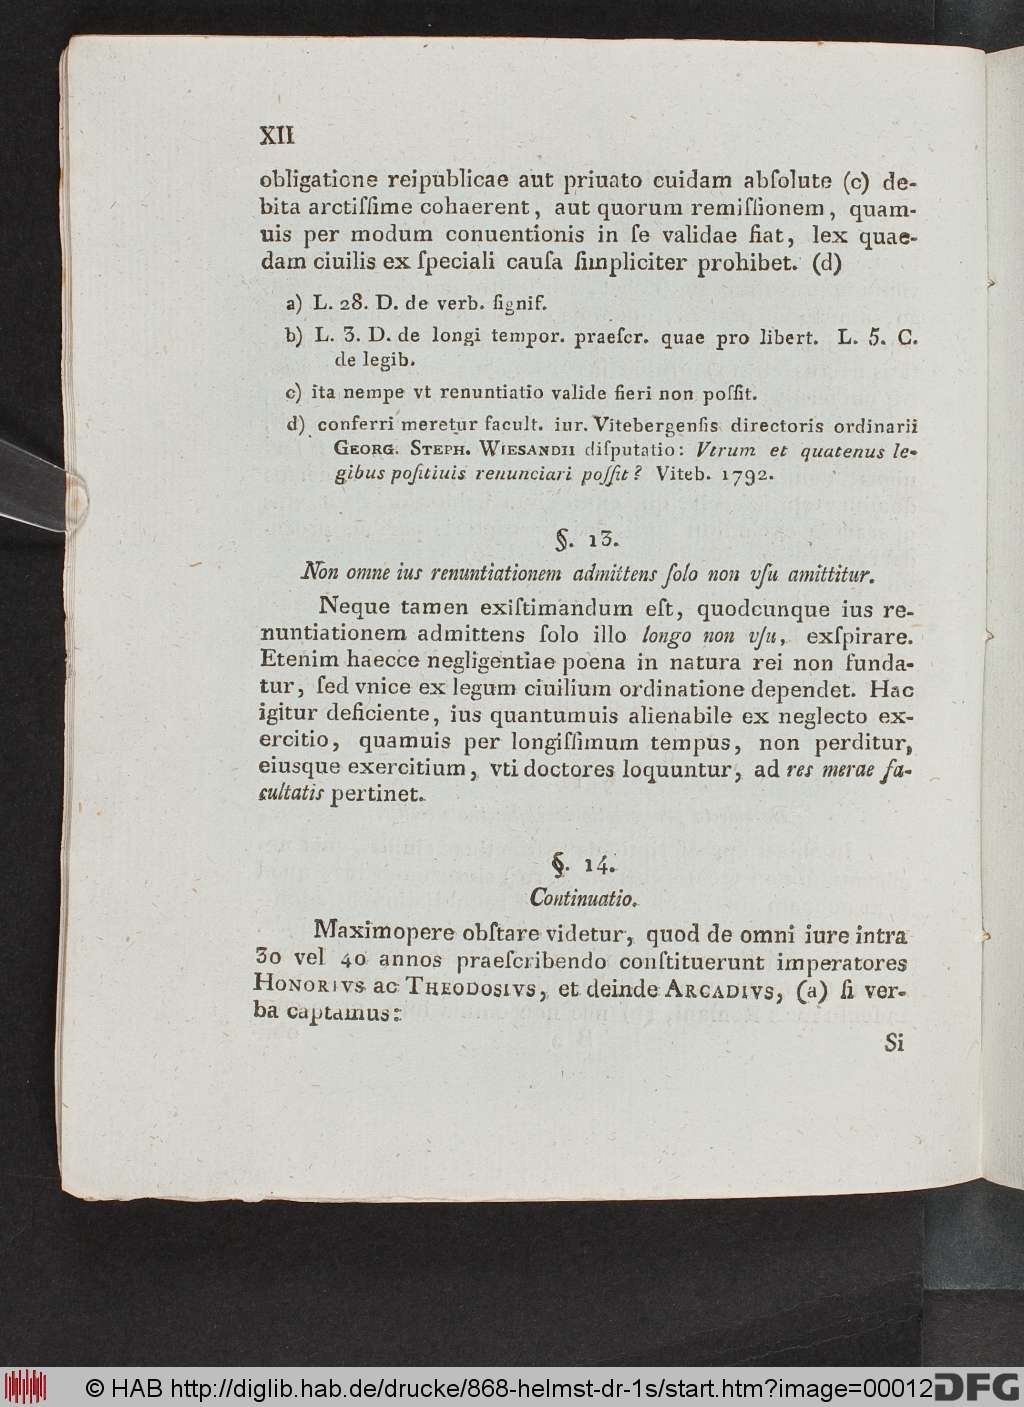 https://diglib.hab.de/drucke/868-helmst-dr-1s/00012.jpg